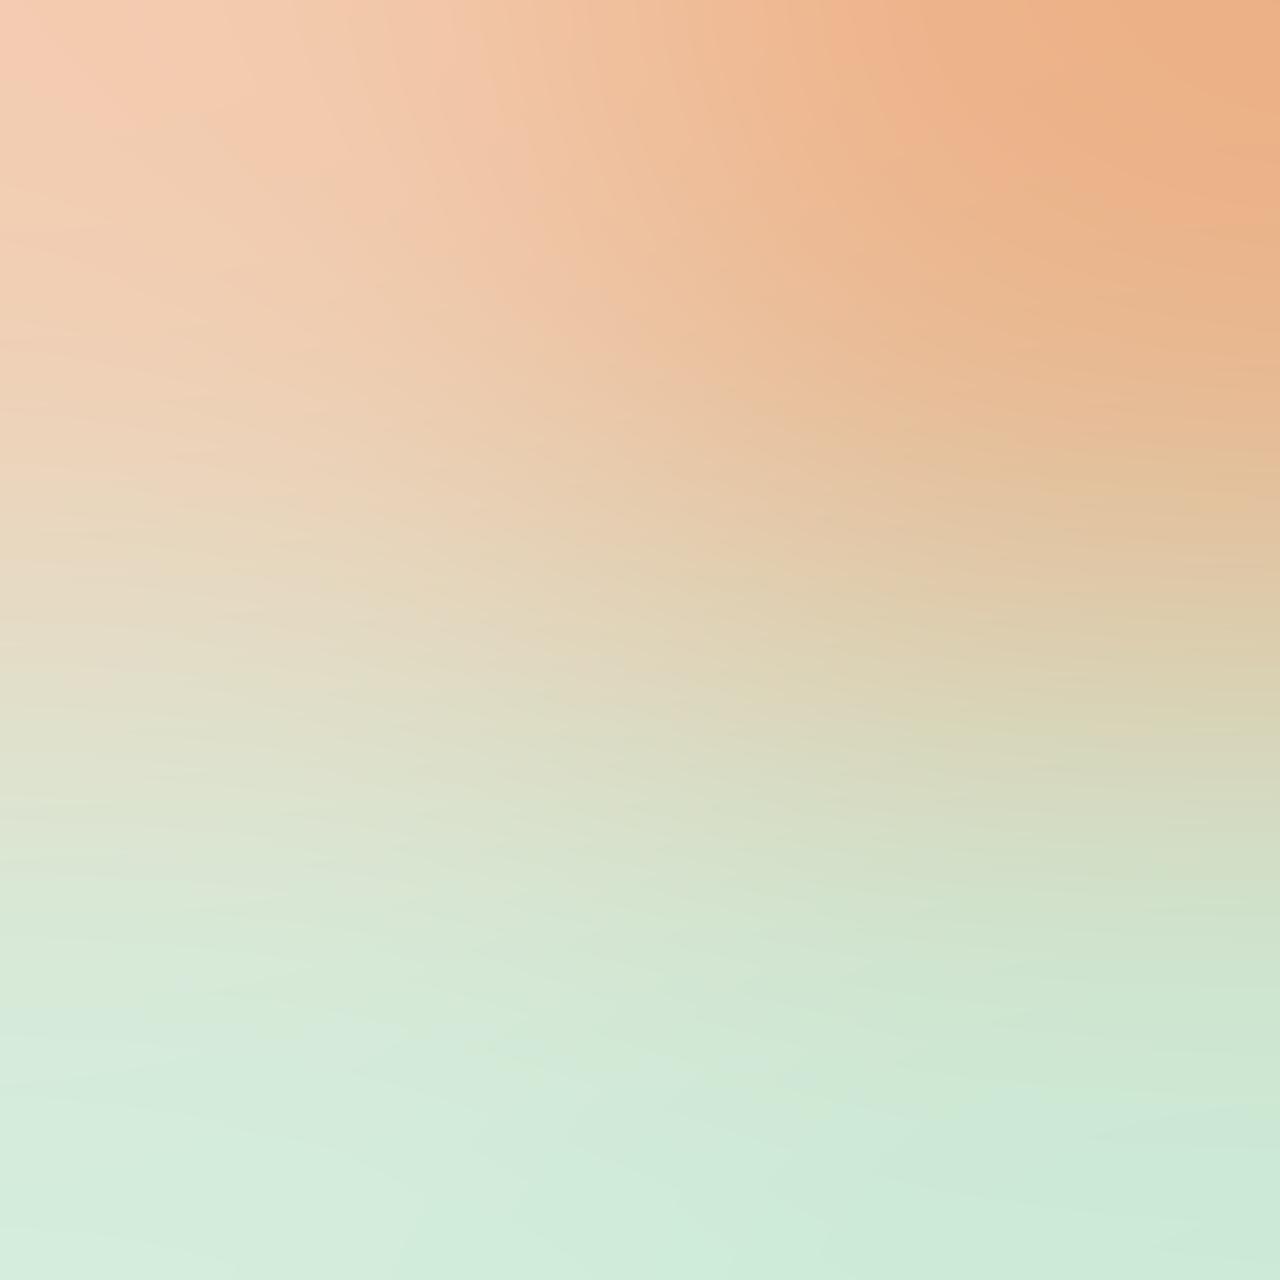 Pastel Orange Wallpaper Iphone ...